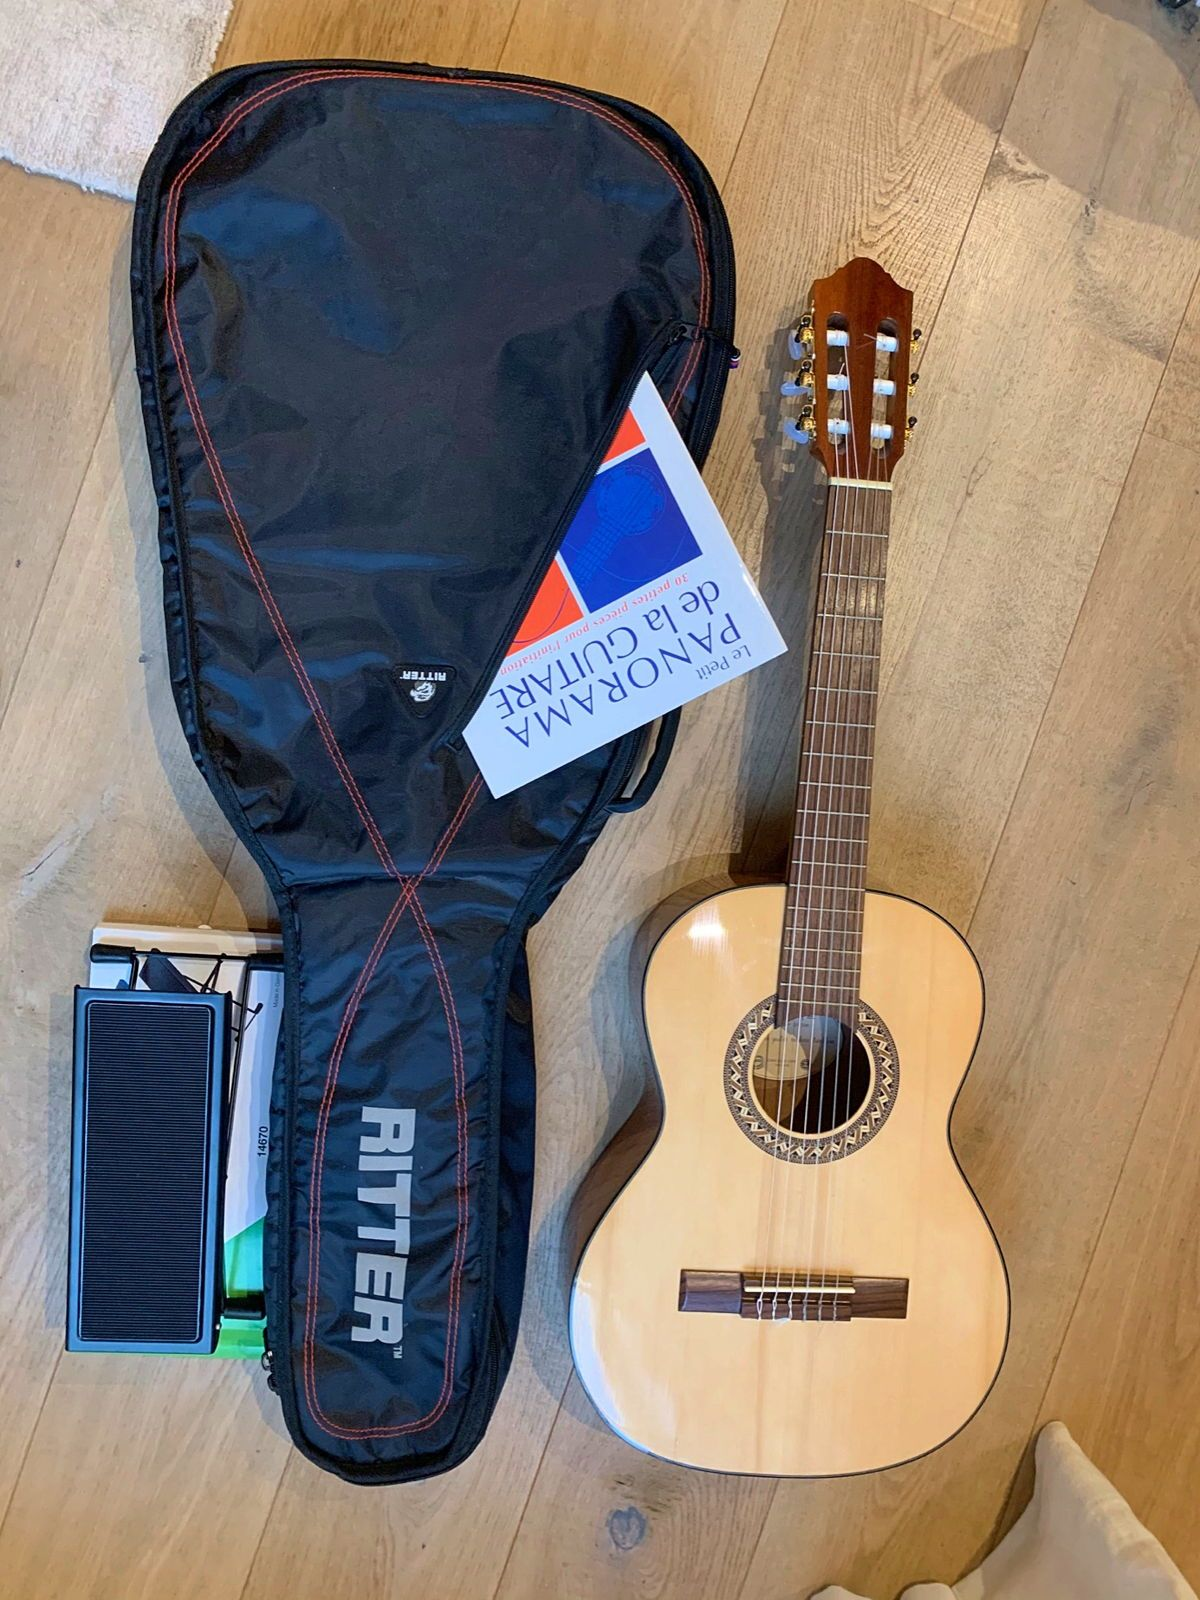 Guitare Classique 3/4Pro Arte, housse, repose-pied et livre musical